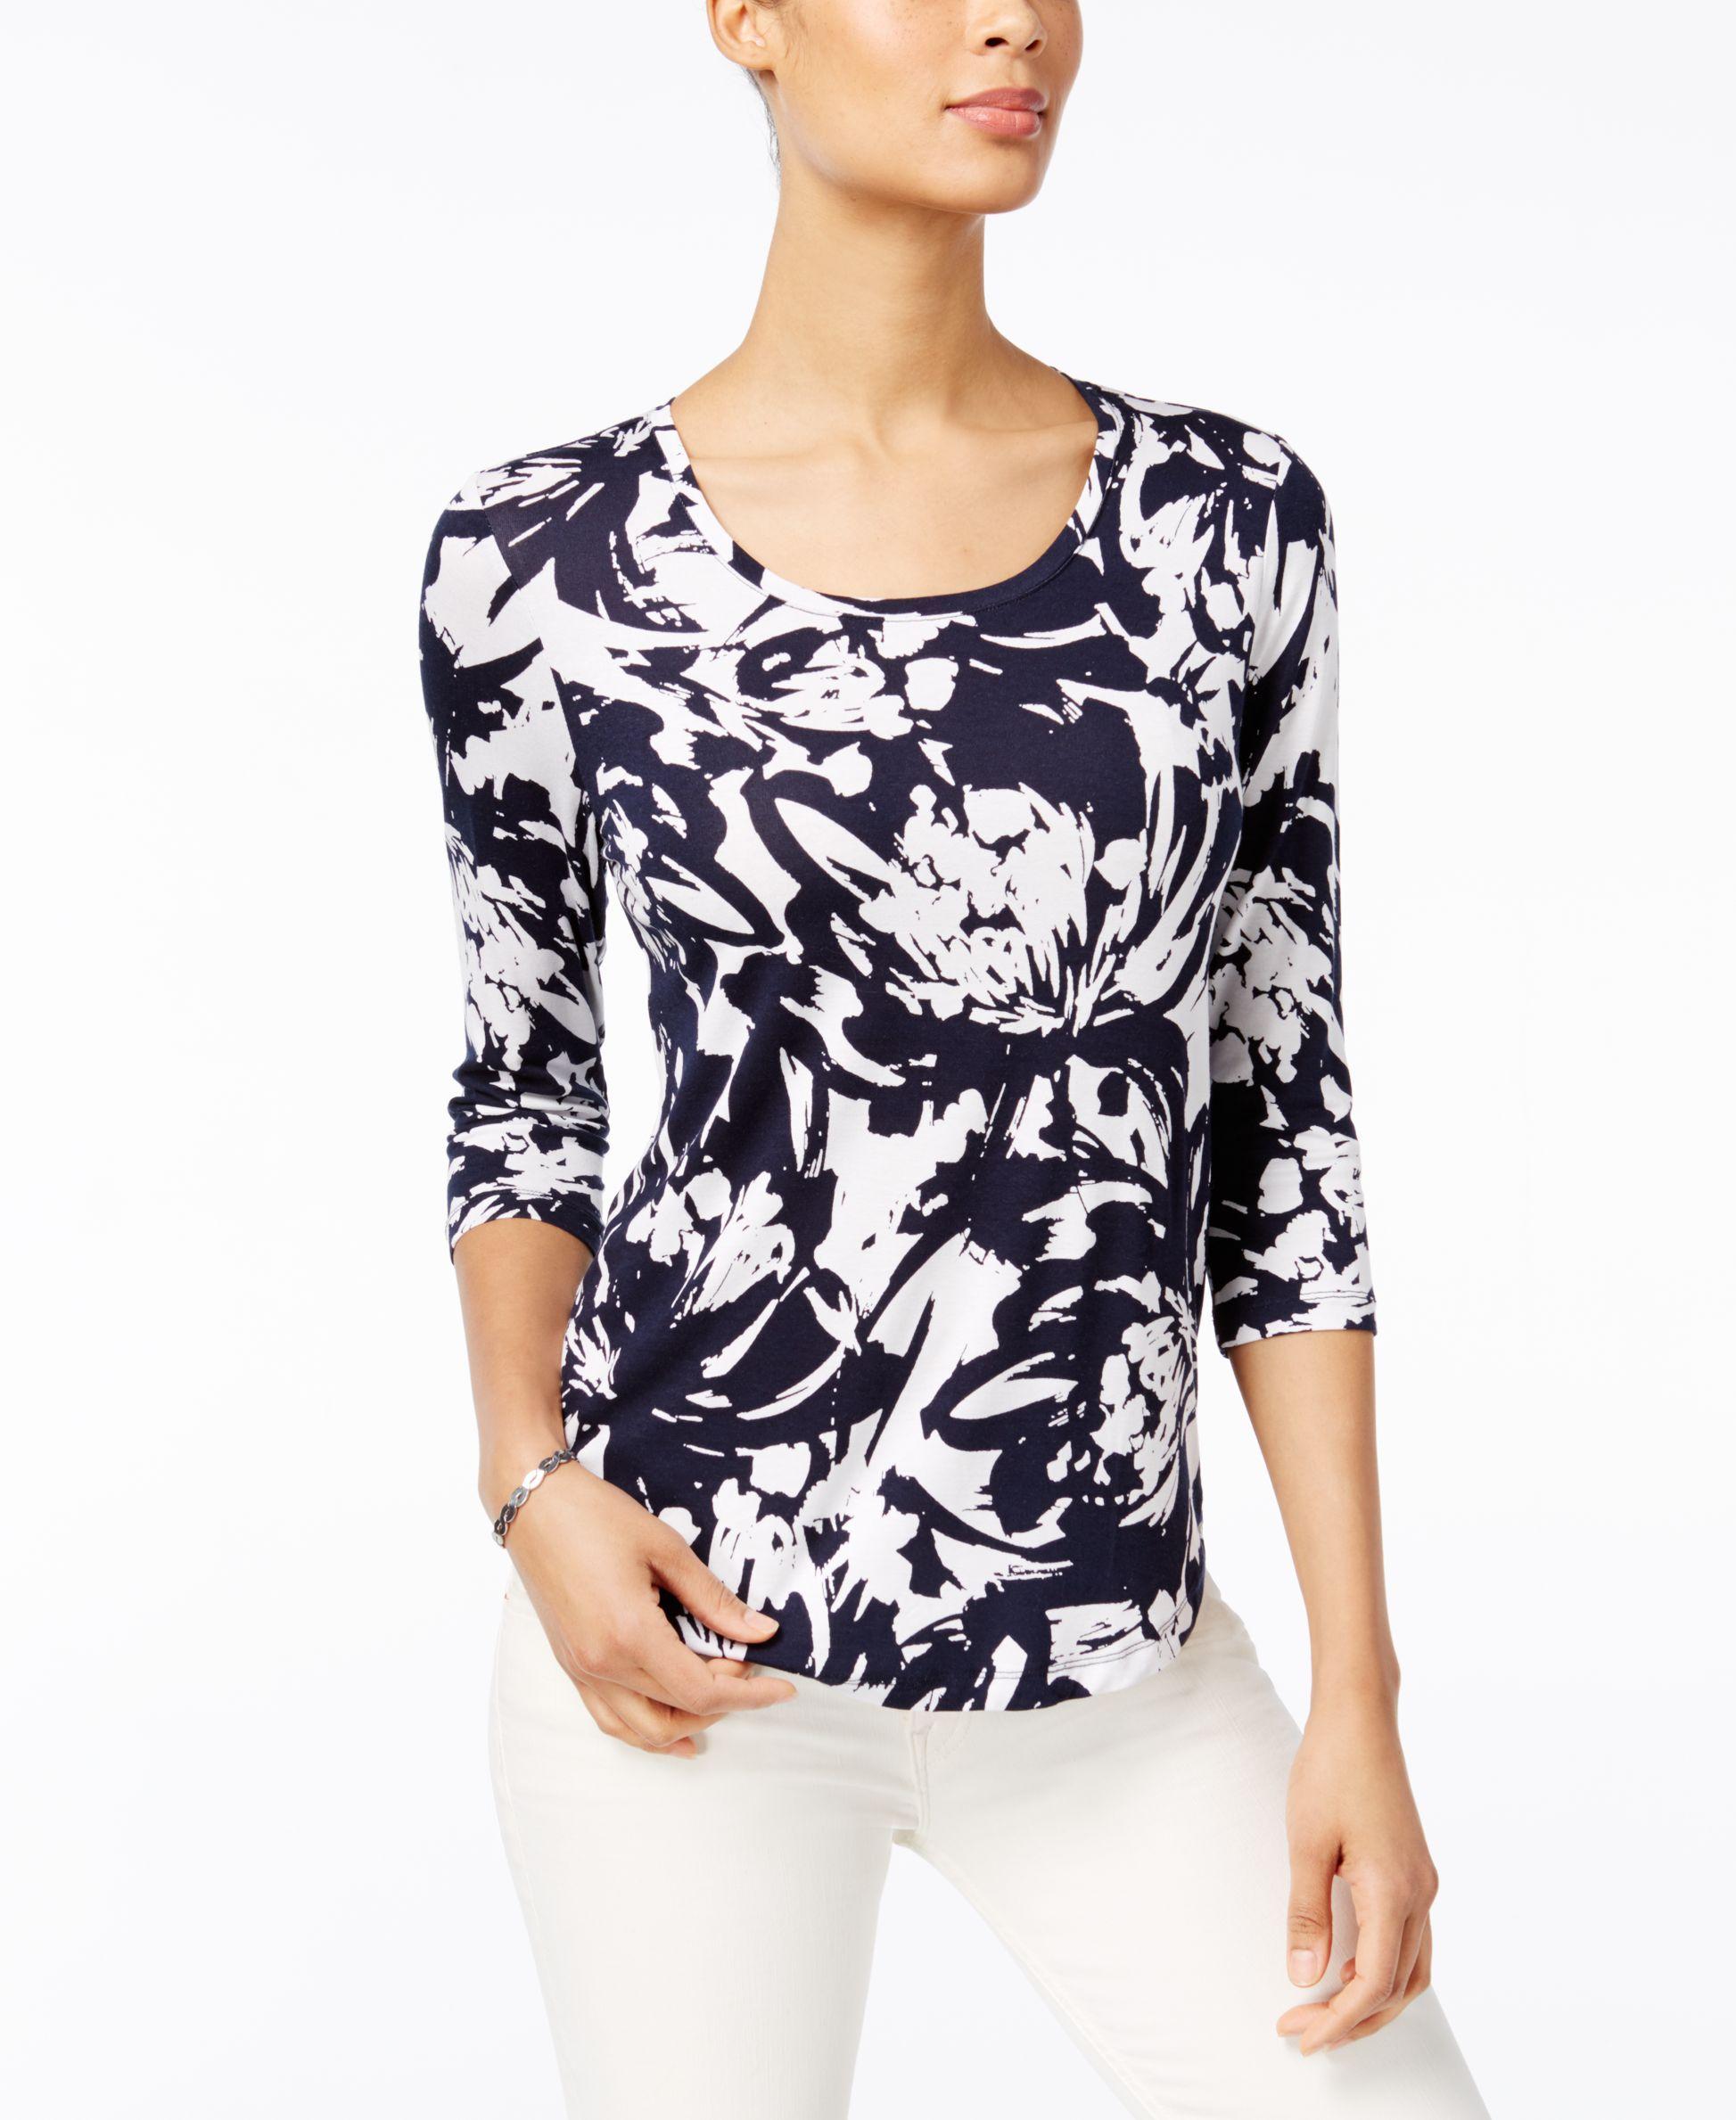 0fbe438b3548d Jm Collection Petite Floral-Print Shirttail Top